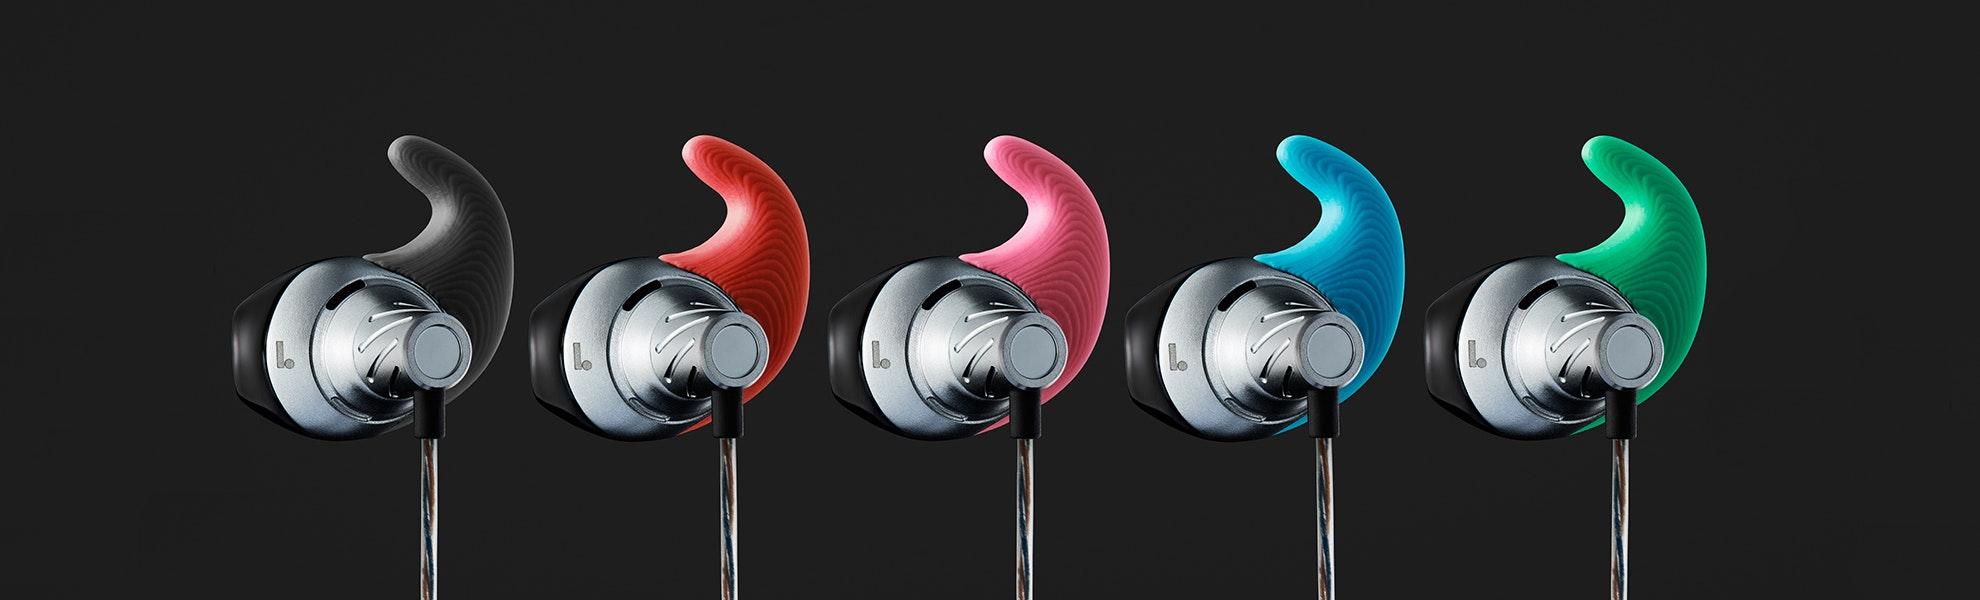 Normal 3D Printed Earphones